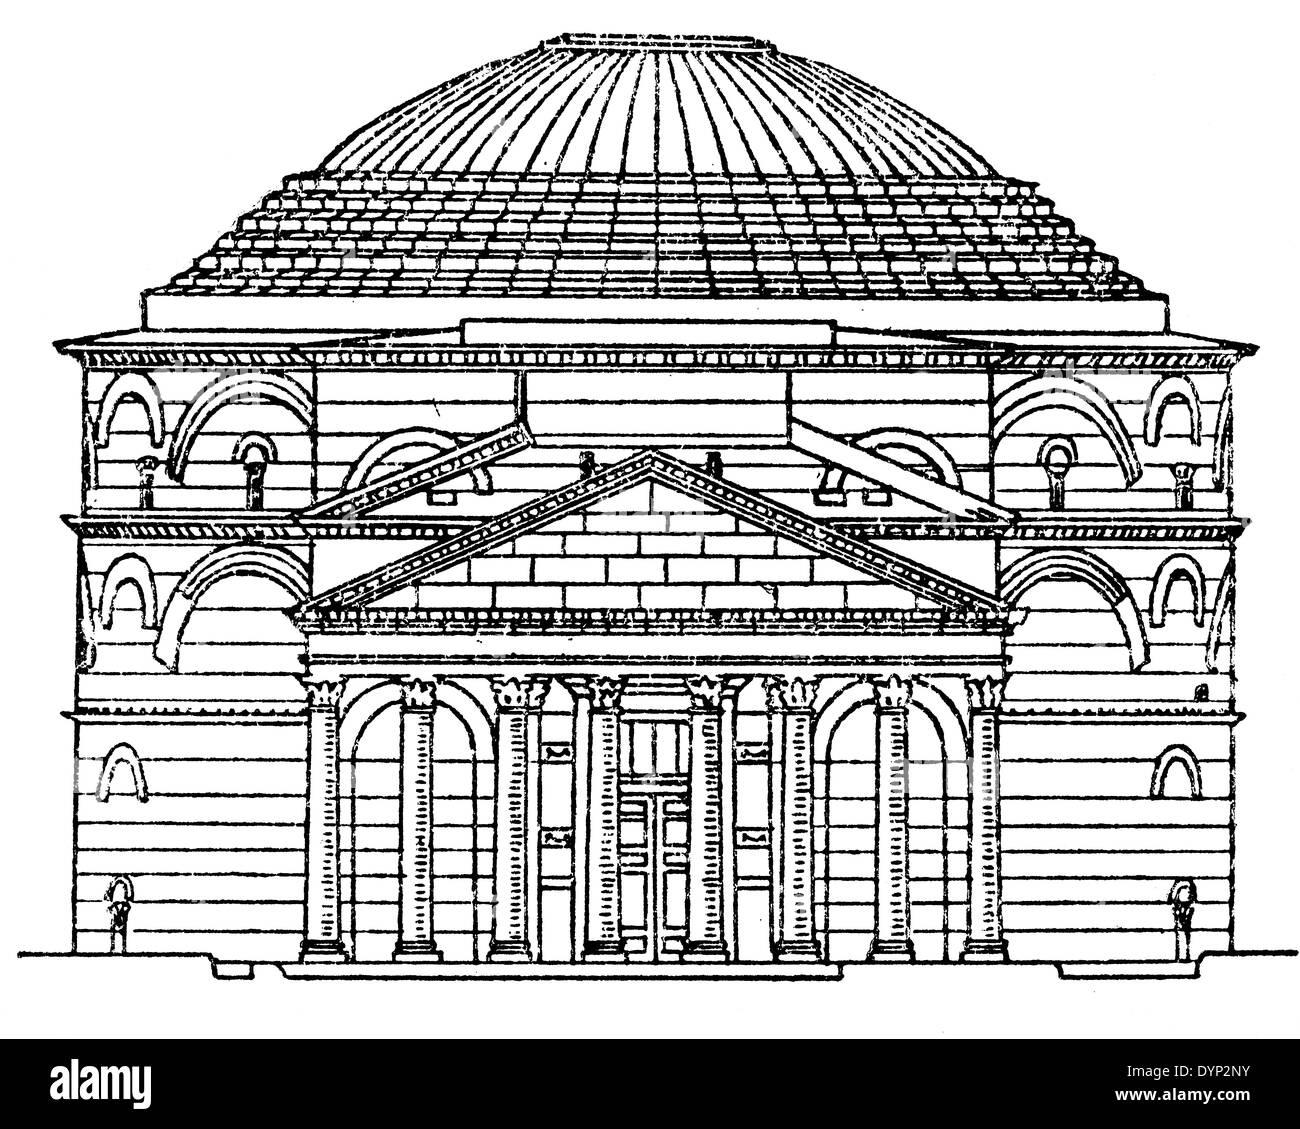 Pantheon, Rome, illustration from Soviet encyclopedia, 1926 - Stock Image